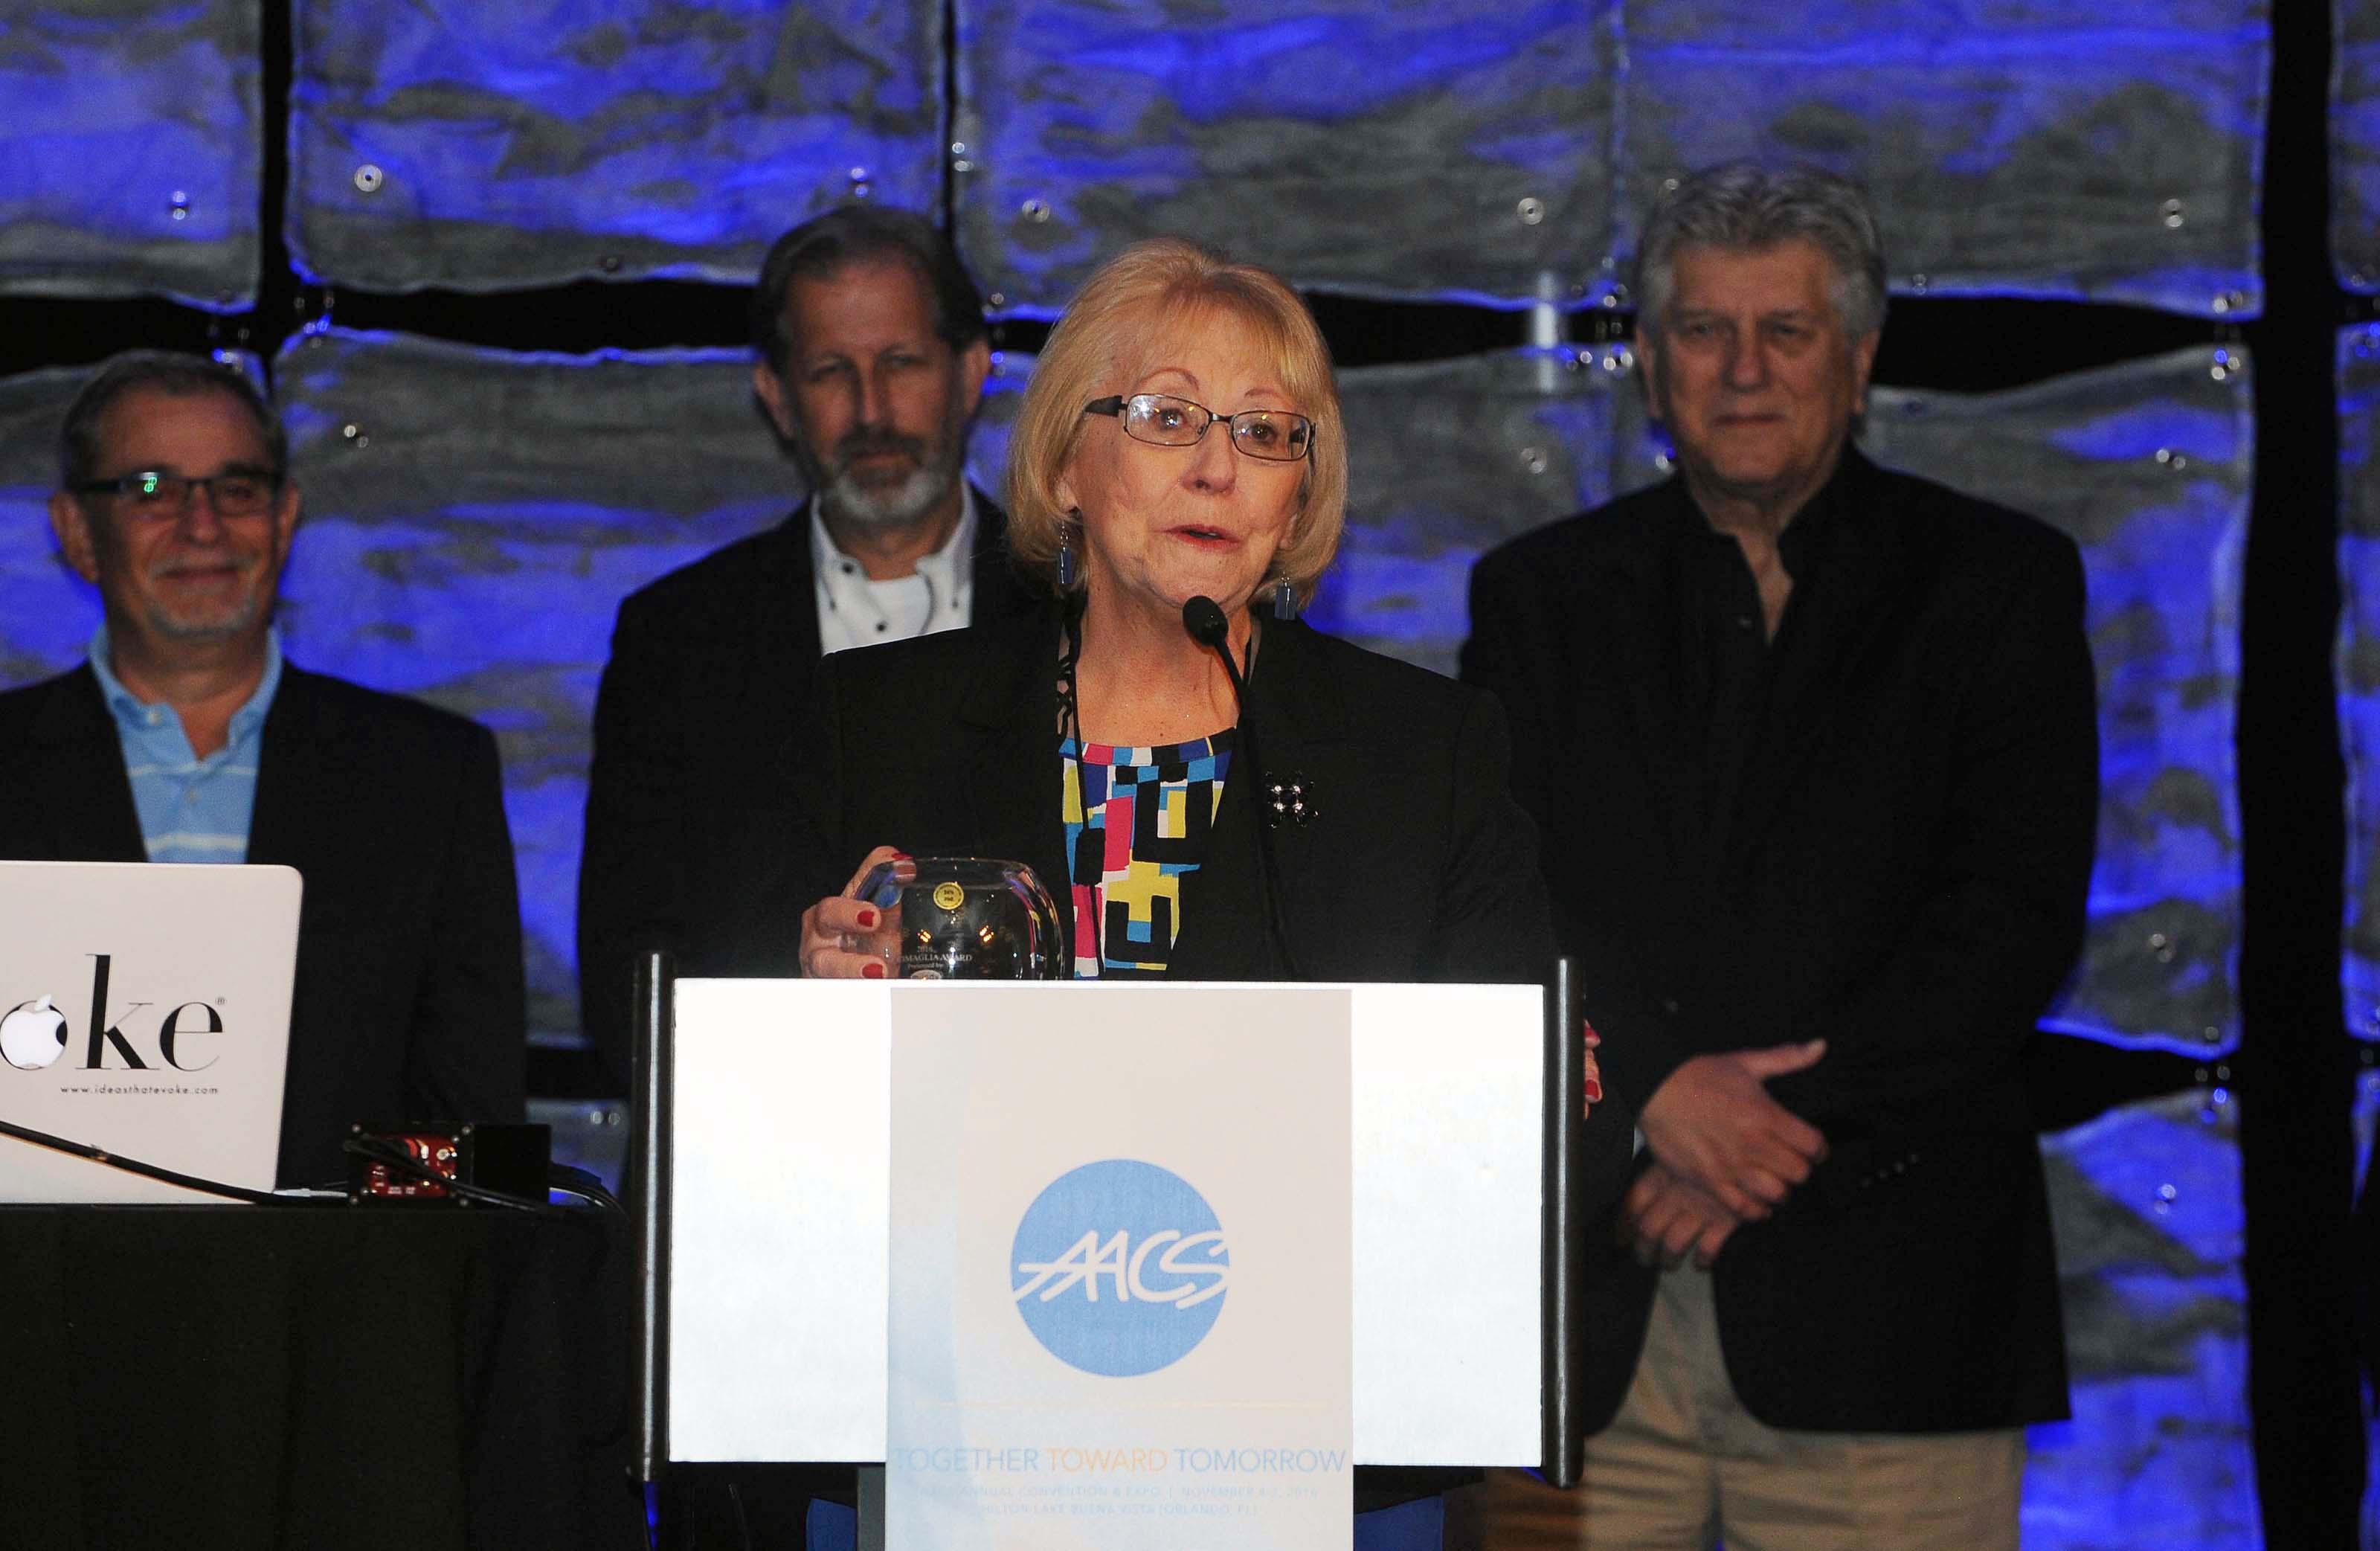 Milady & AACS Announce Sally Samuels as 2016 N.F. Cimaglia Award Recipient